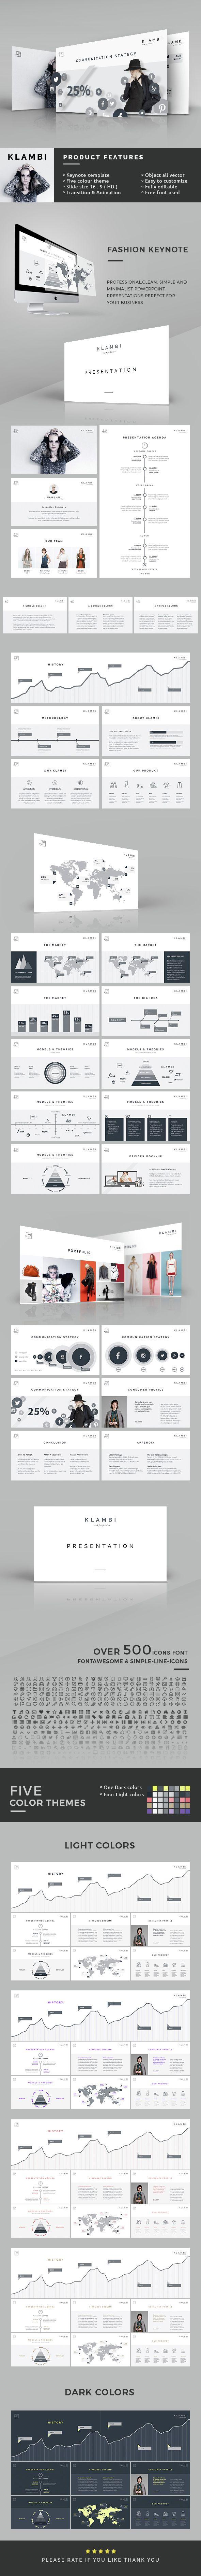 Fashion Keynote Template - Creative Keynote Templates